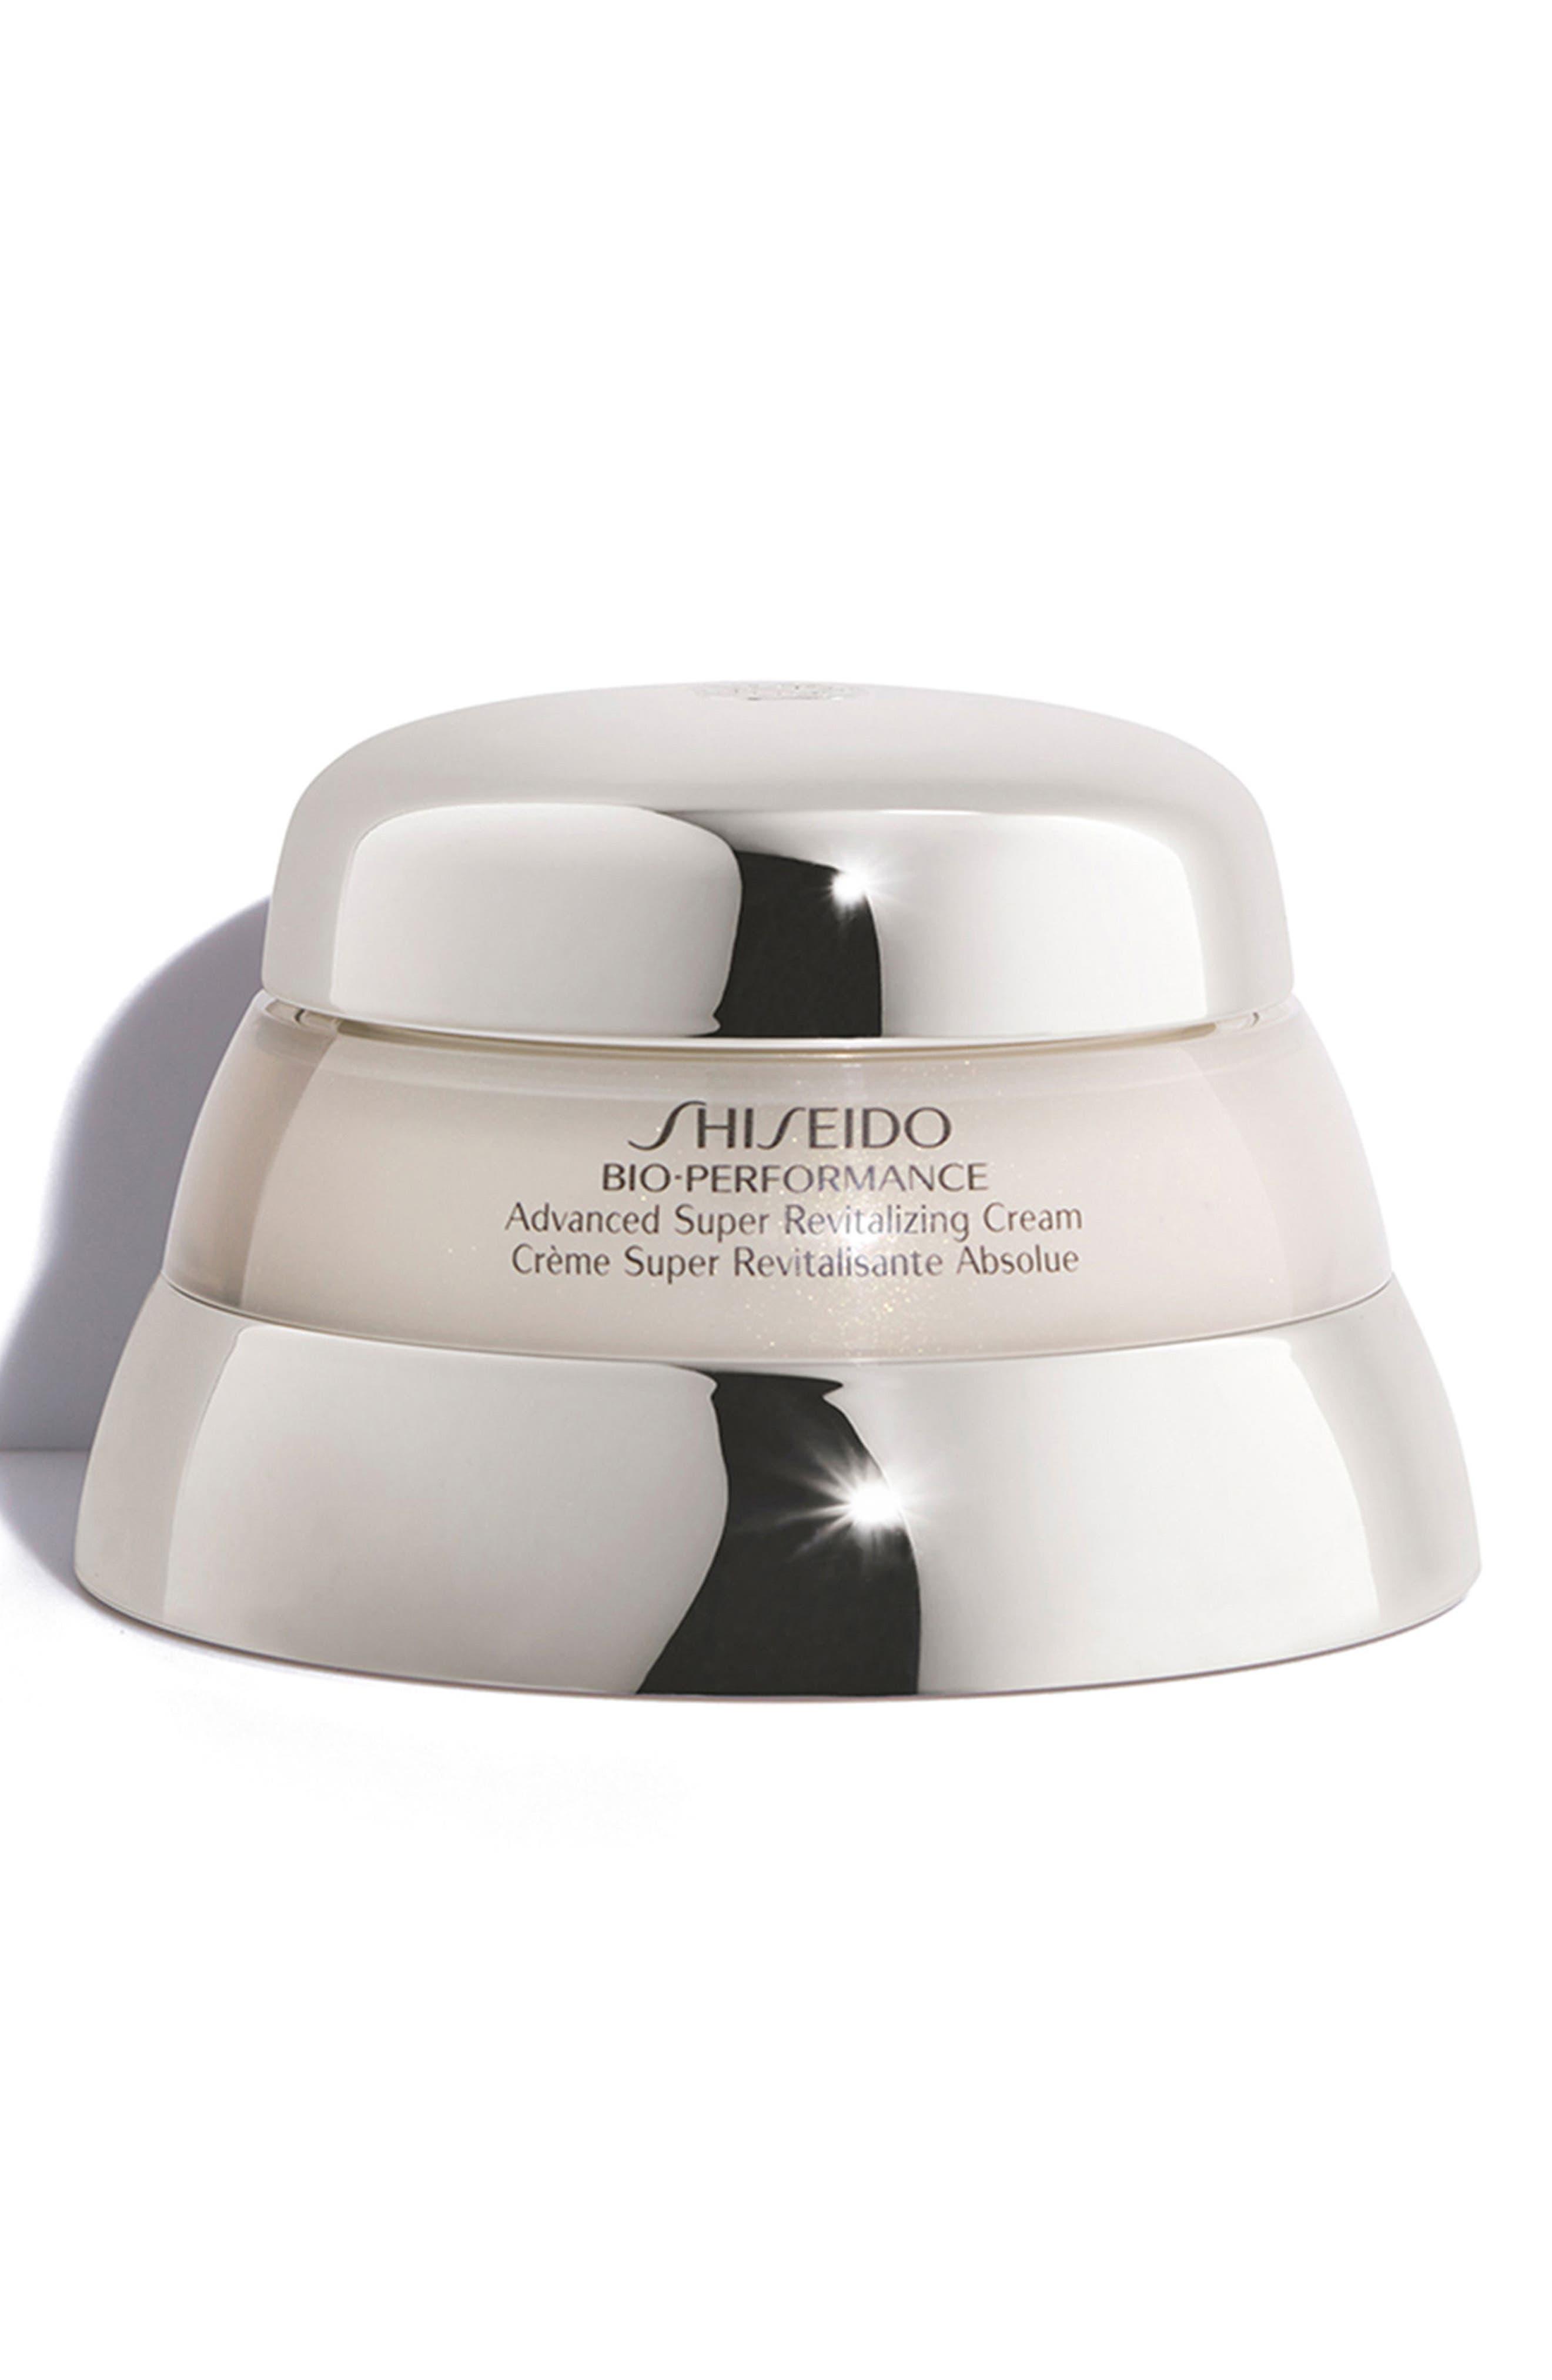 Main Image - Shiseido 'Bio-Performance' Advance Super Revitalizing Cream